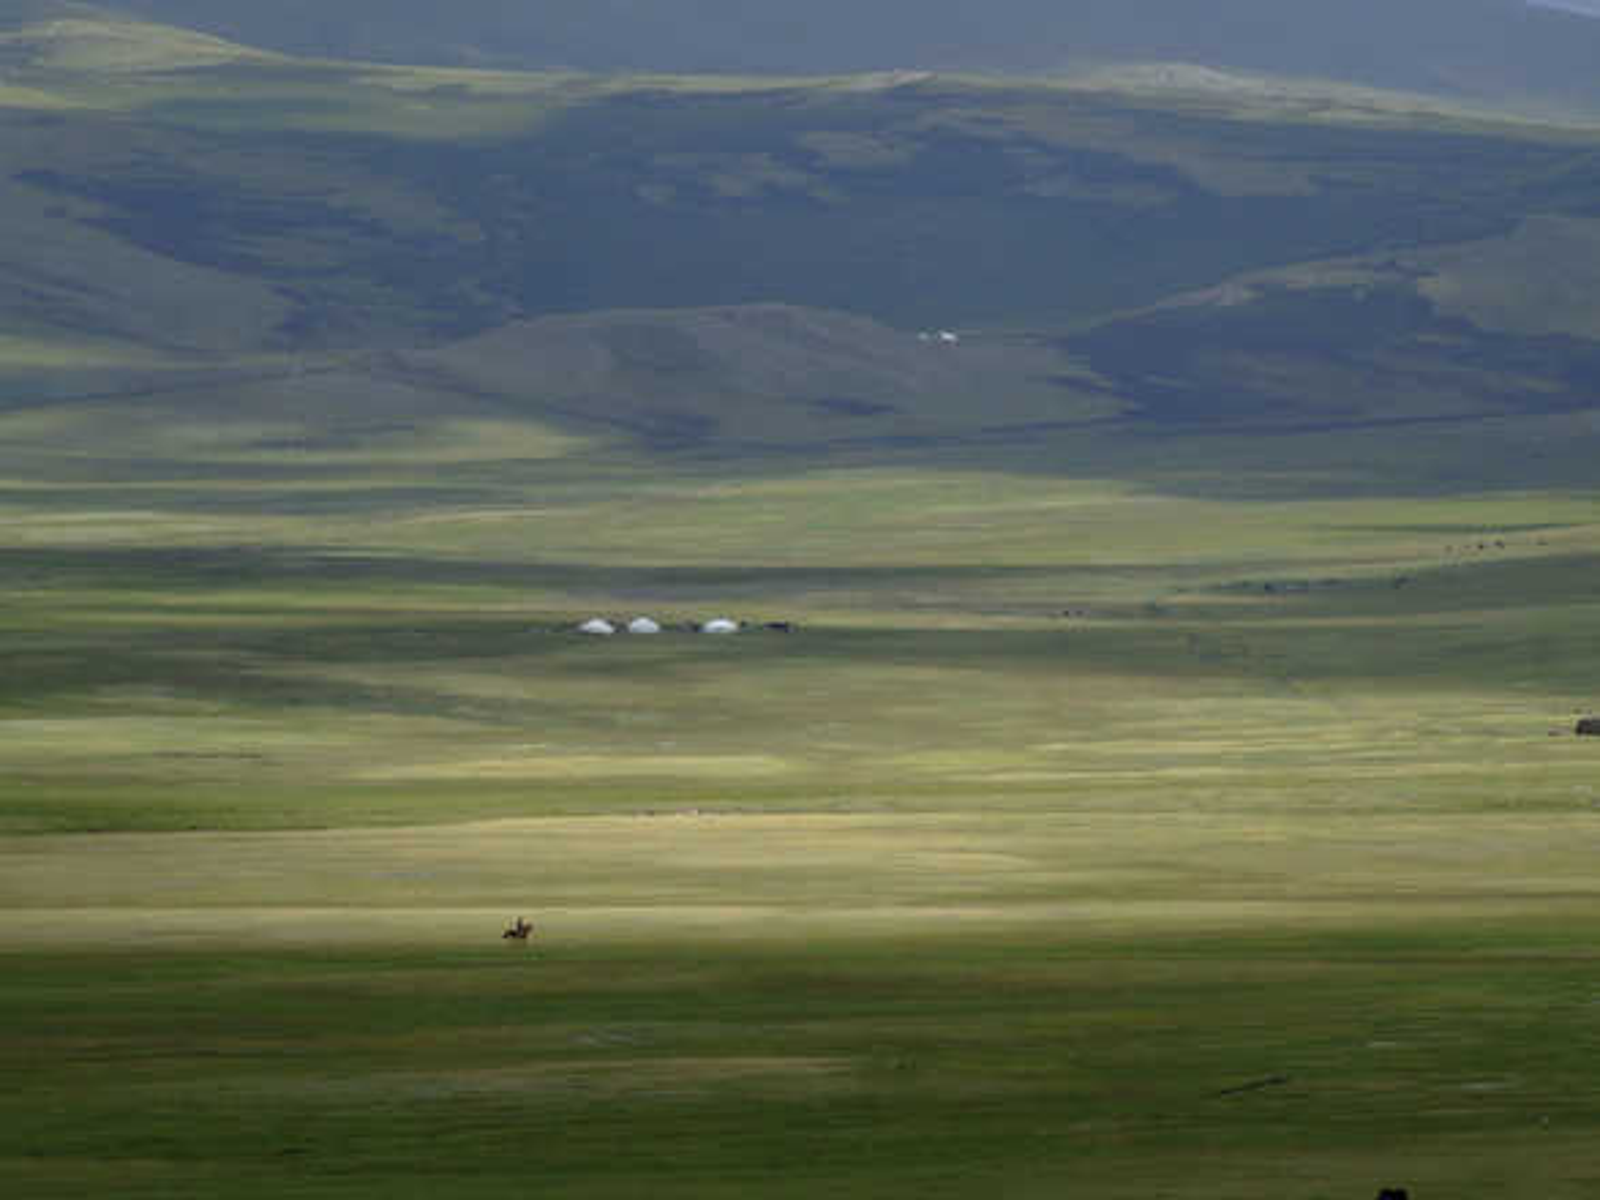 Liberté en Altaï - Olivier Föllmi